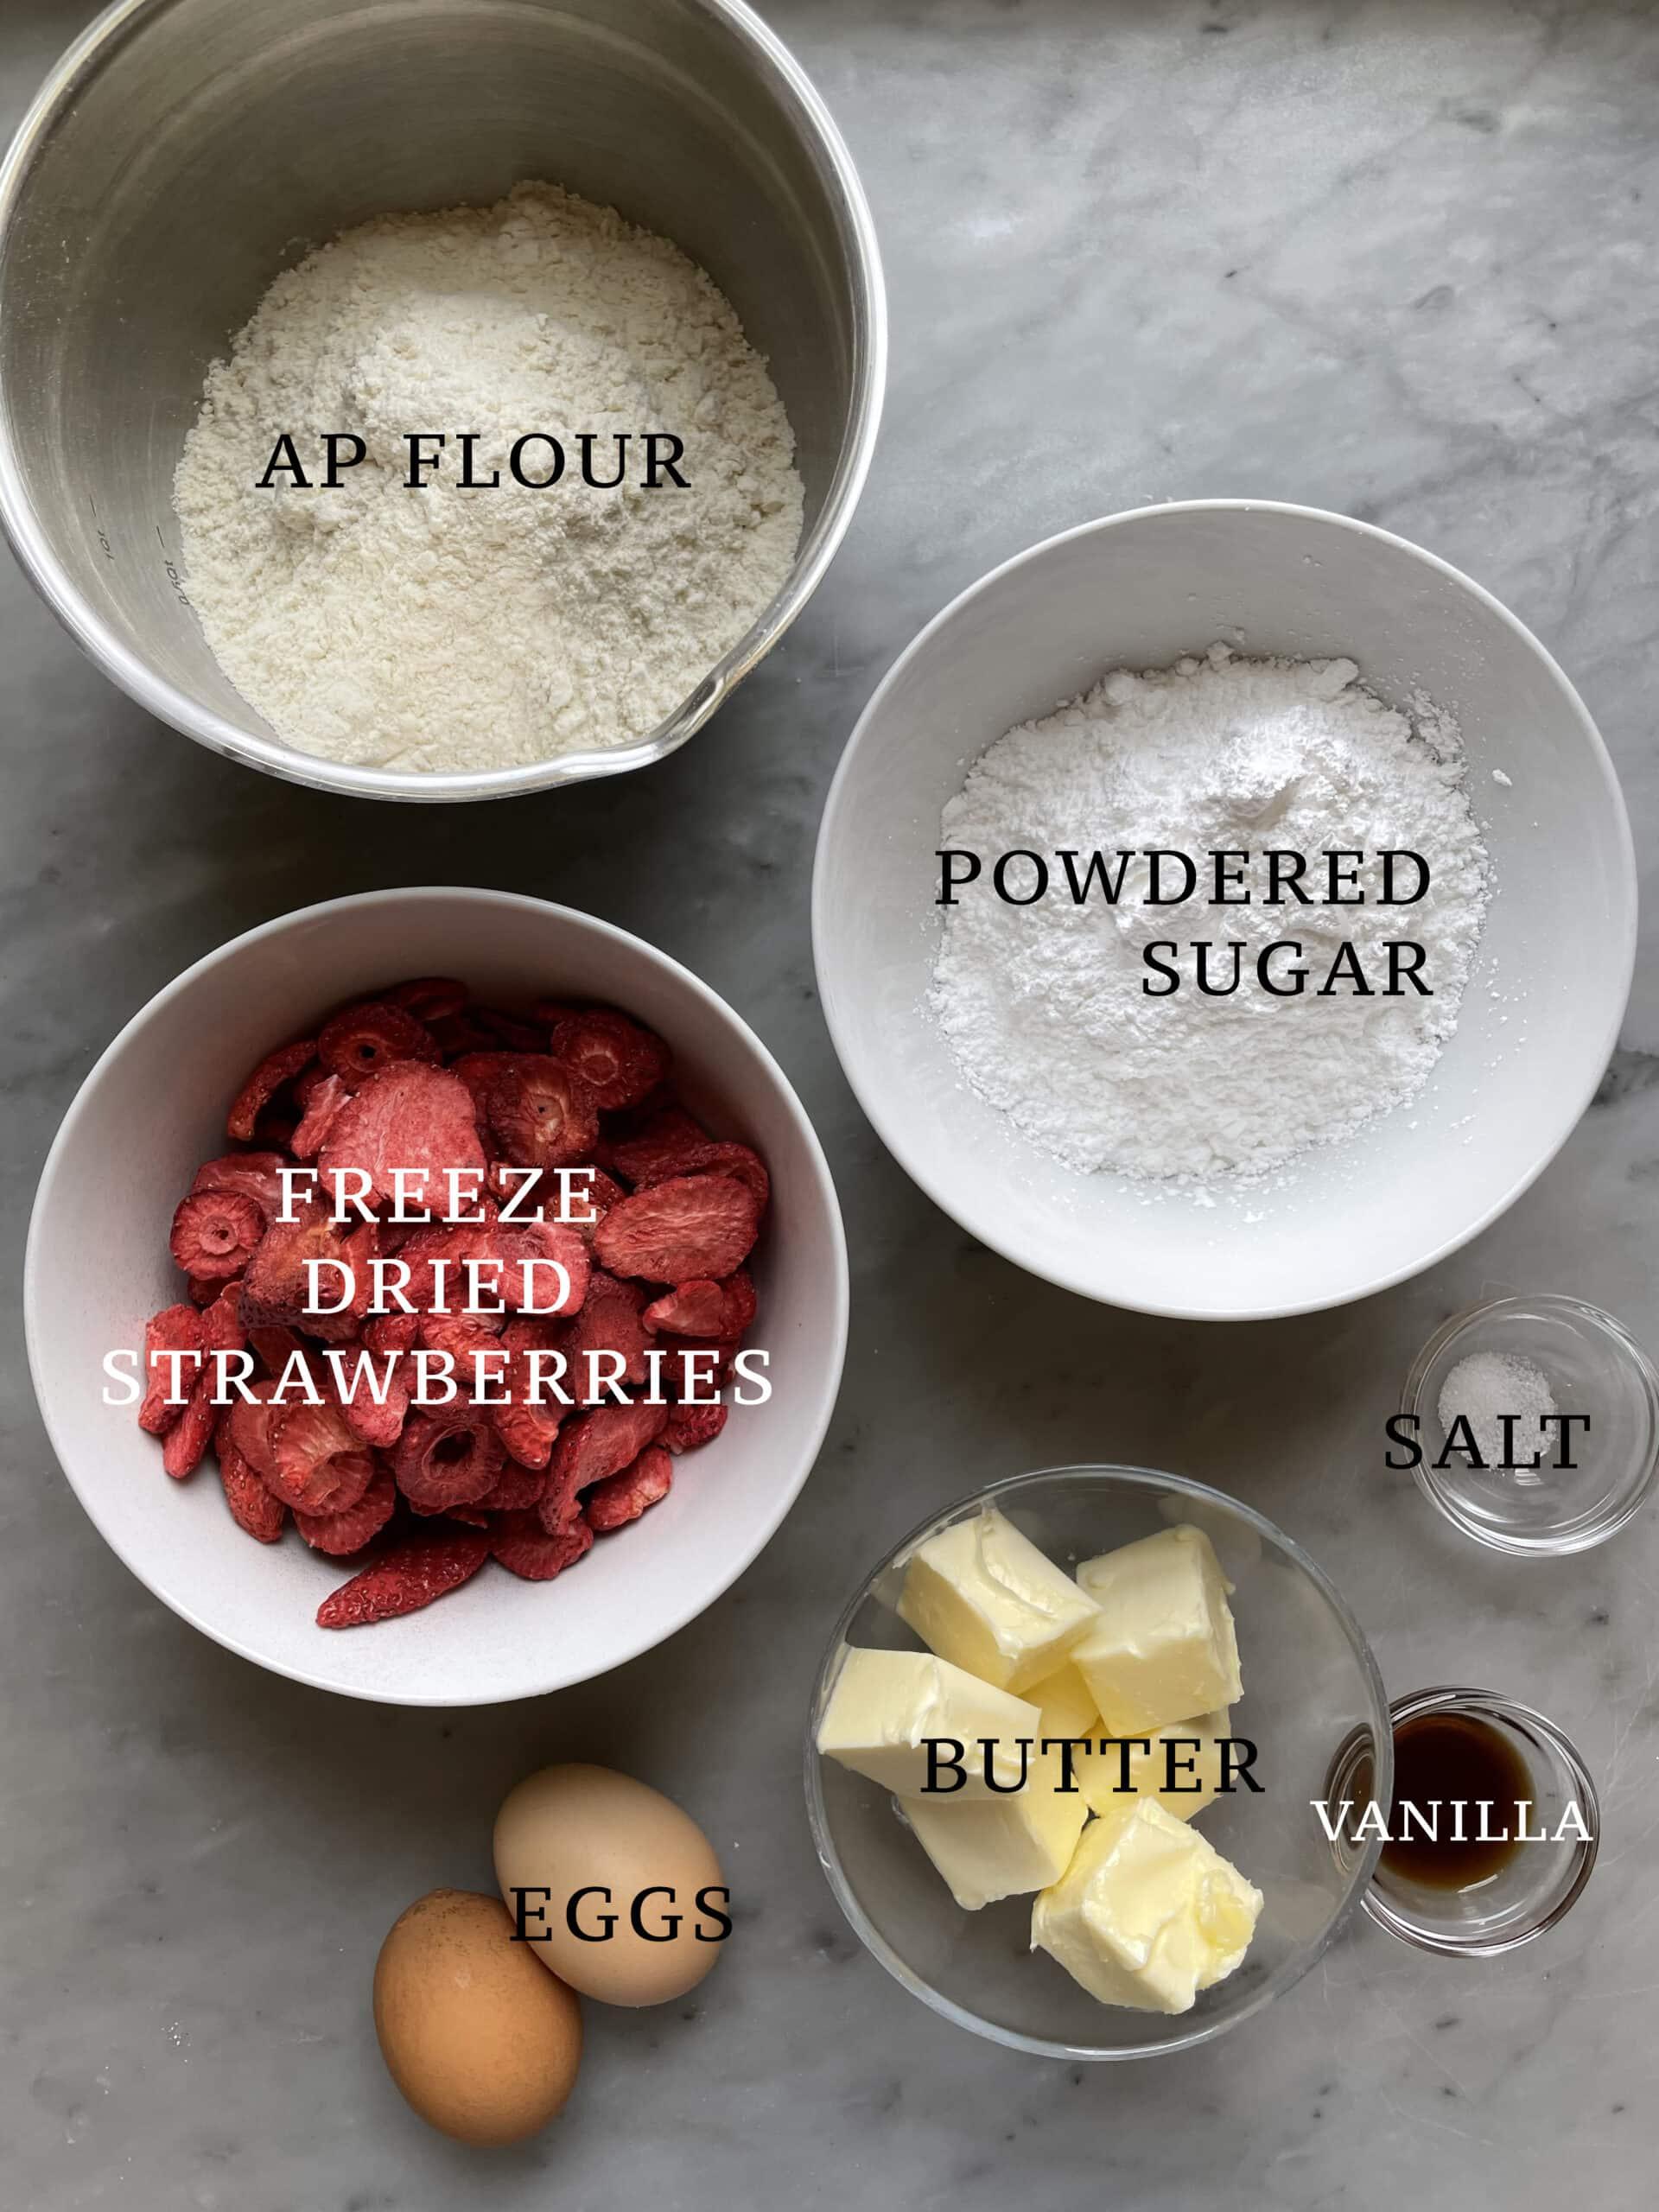 Image of the ingredients needed to make strawberry vanilla pinwheel cookies.